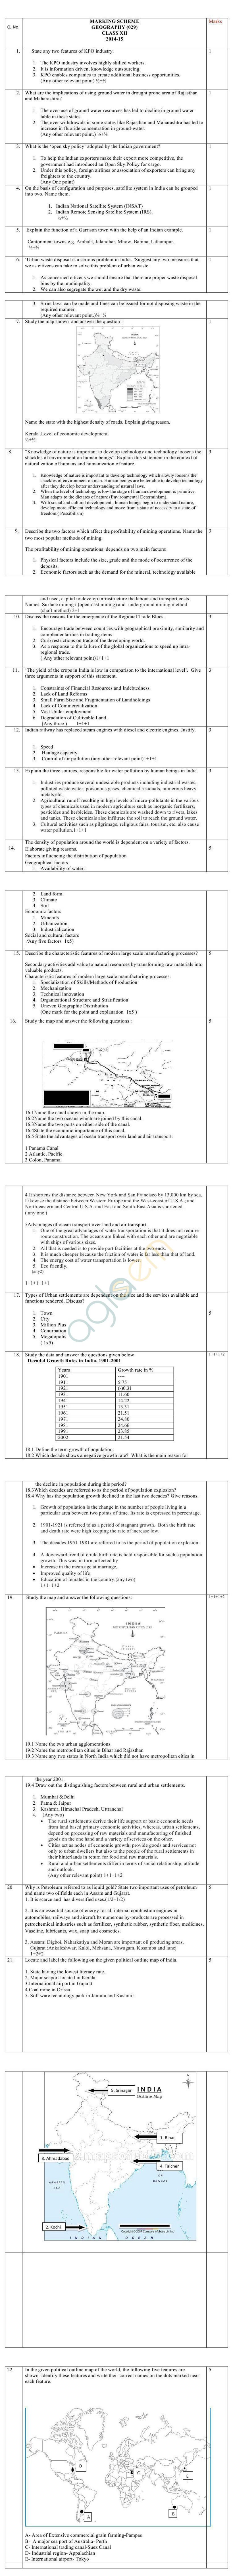 CBSE Class XII Marking Scheme 2015 Geography